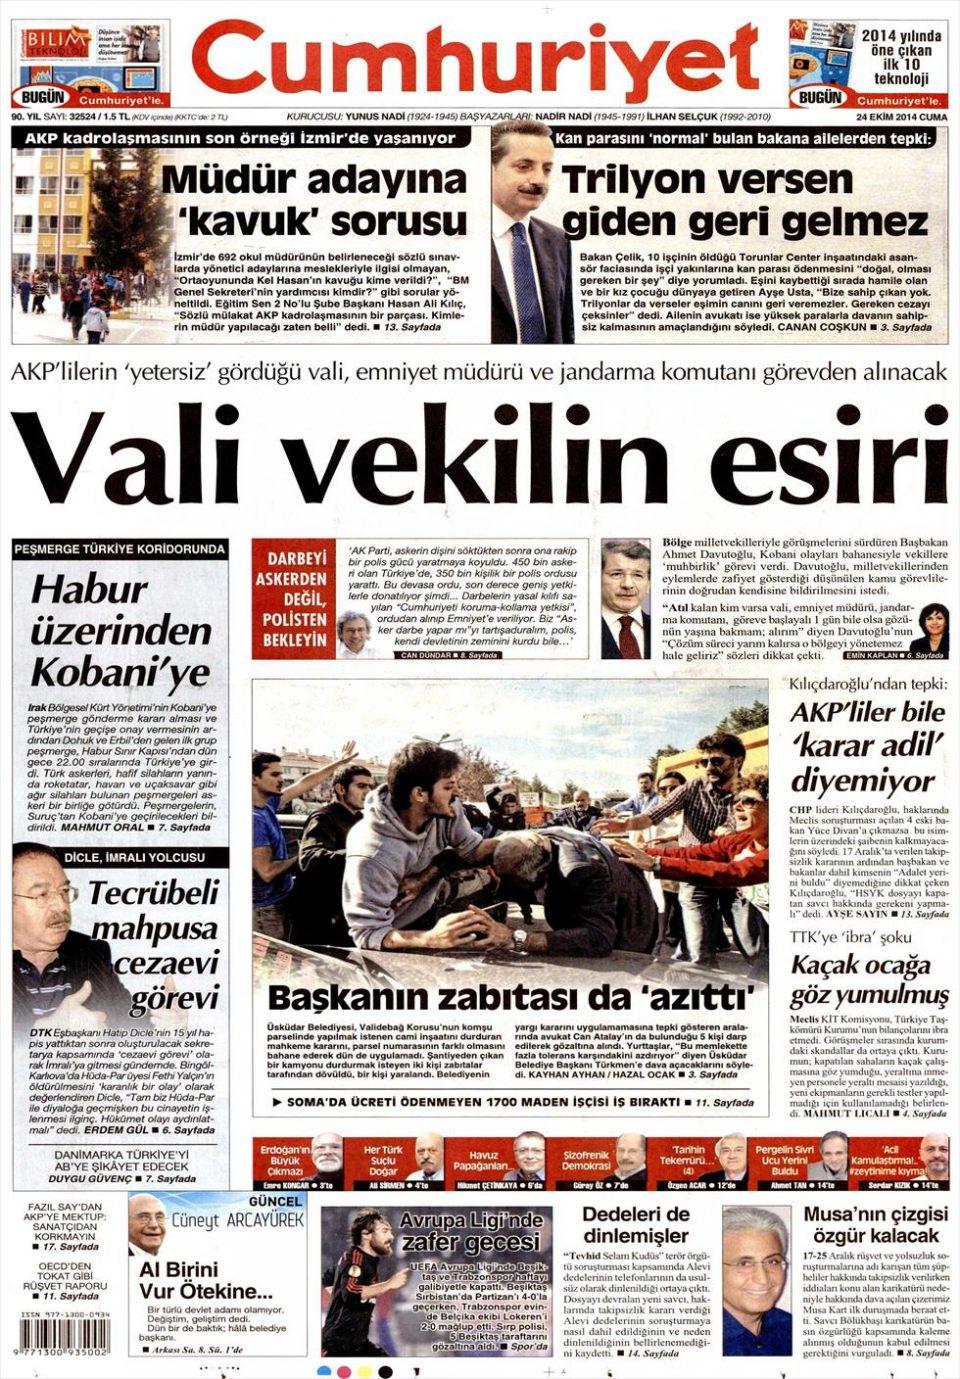 24 Ekim 2014 gazete manşetleri 5